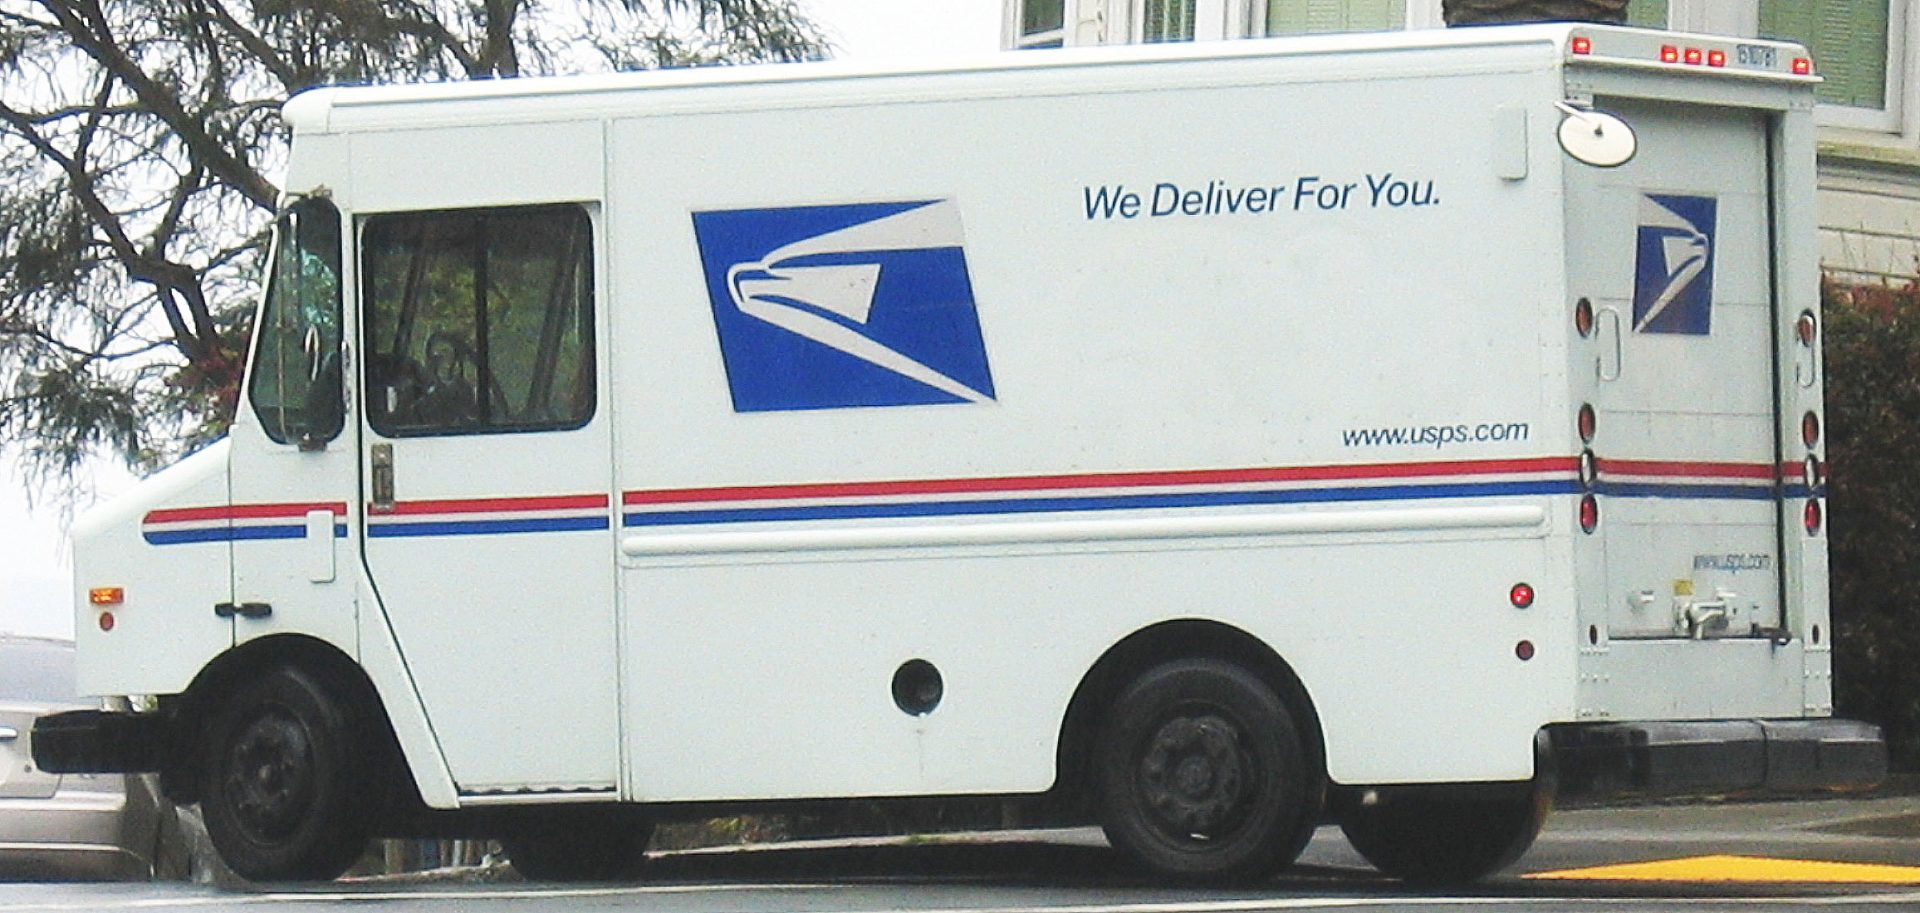 U.S. Postal Service on the Decline